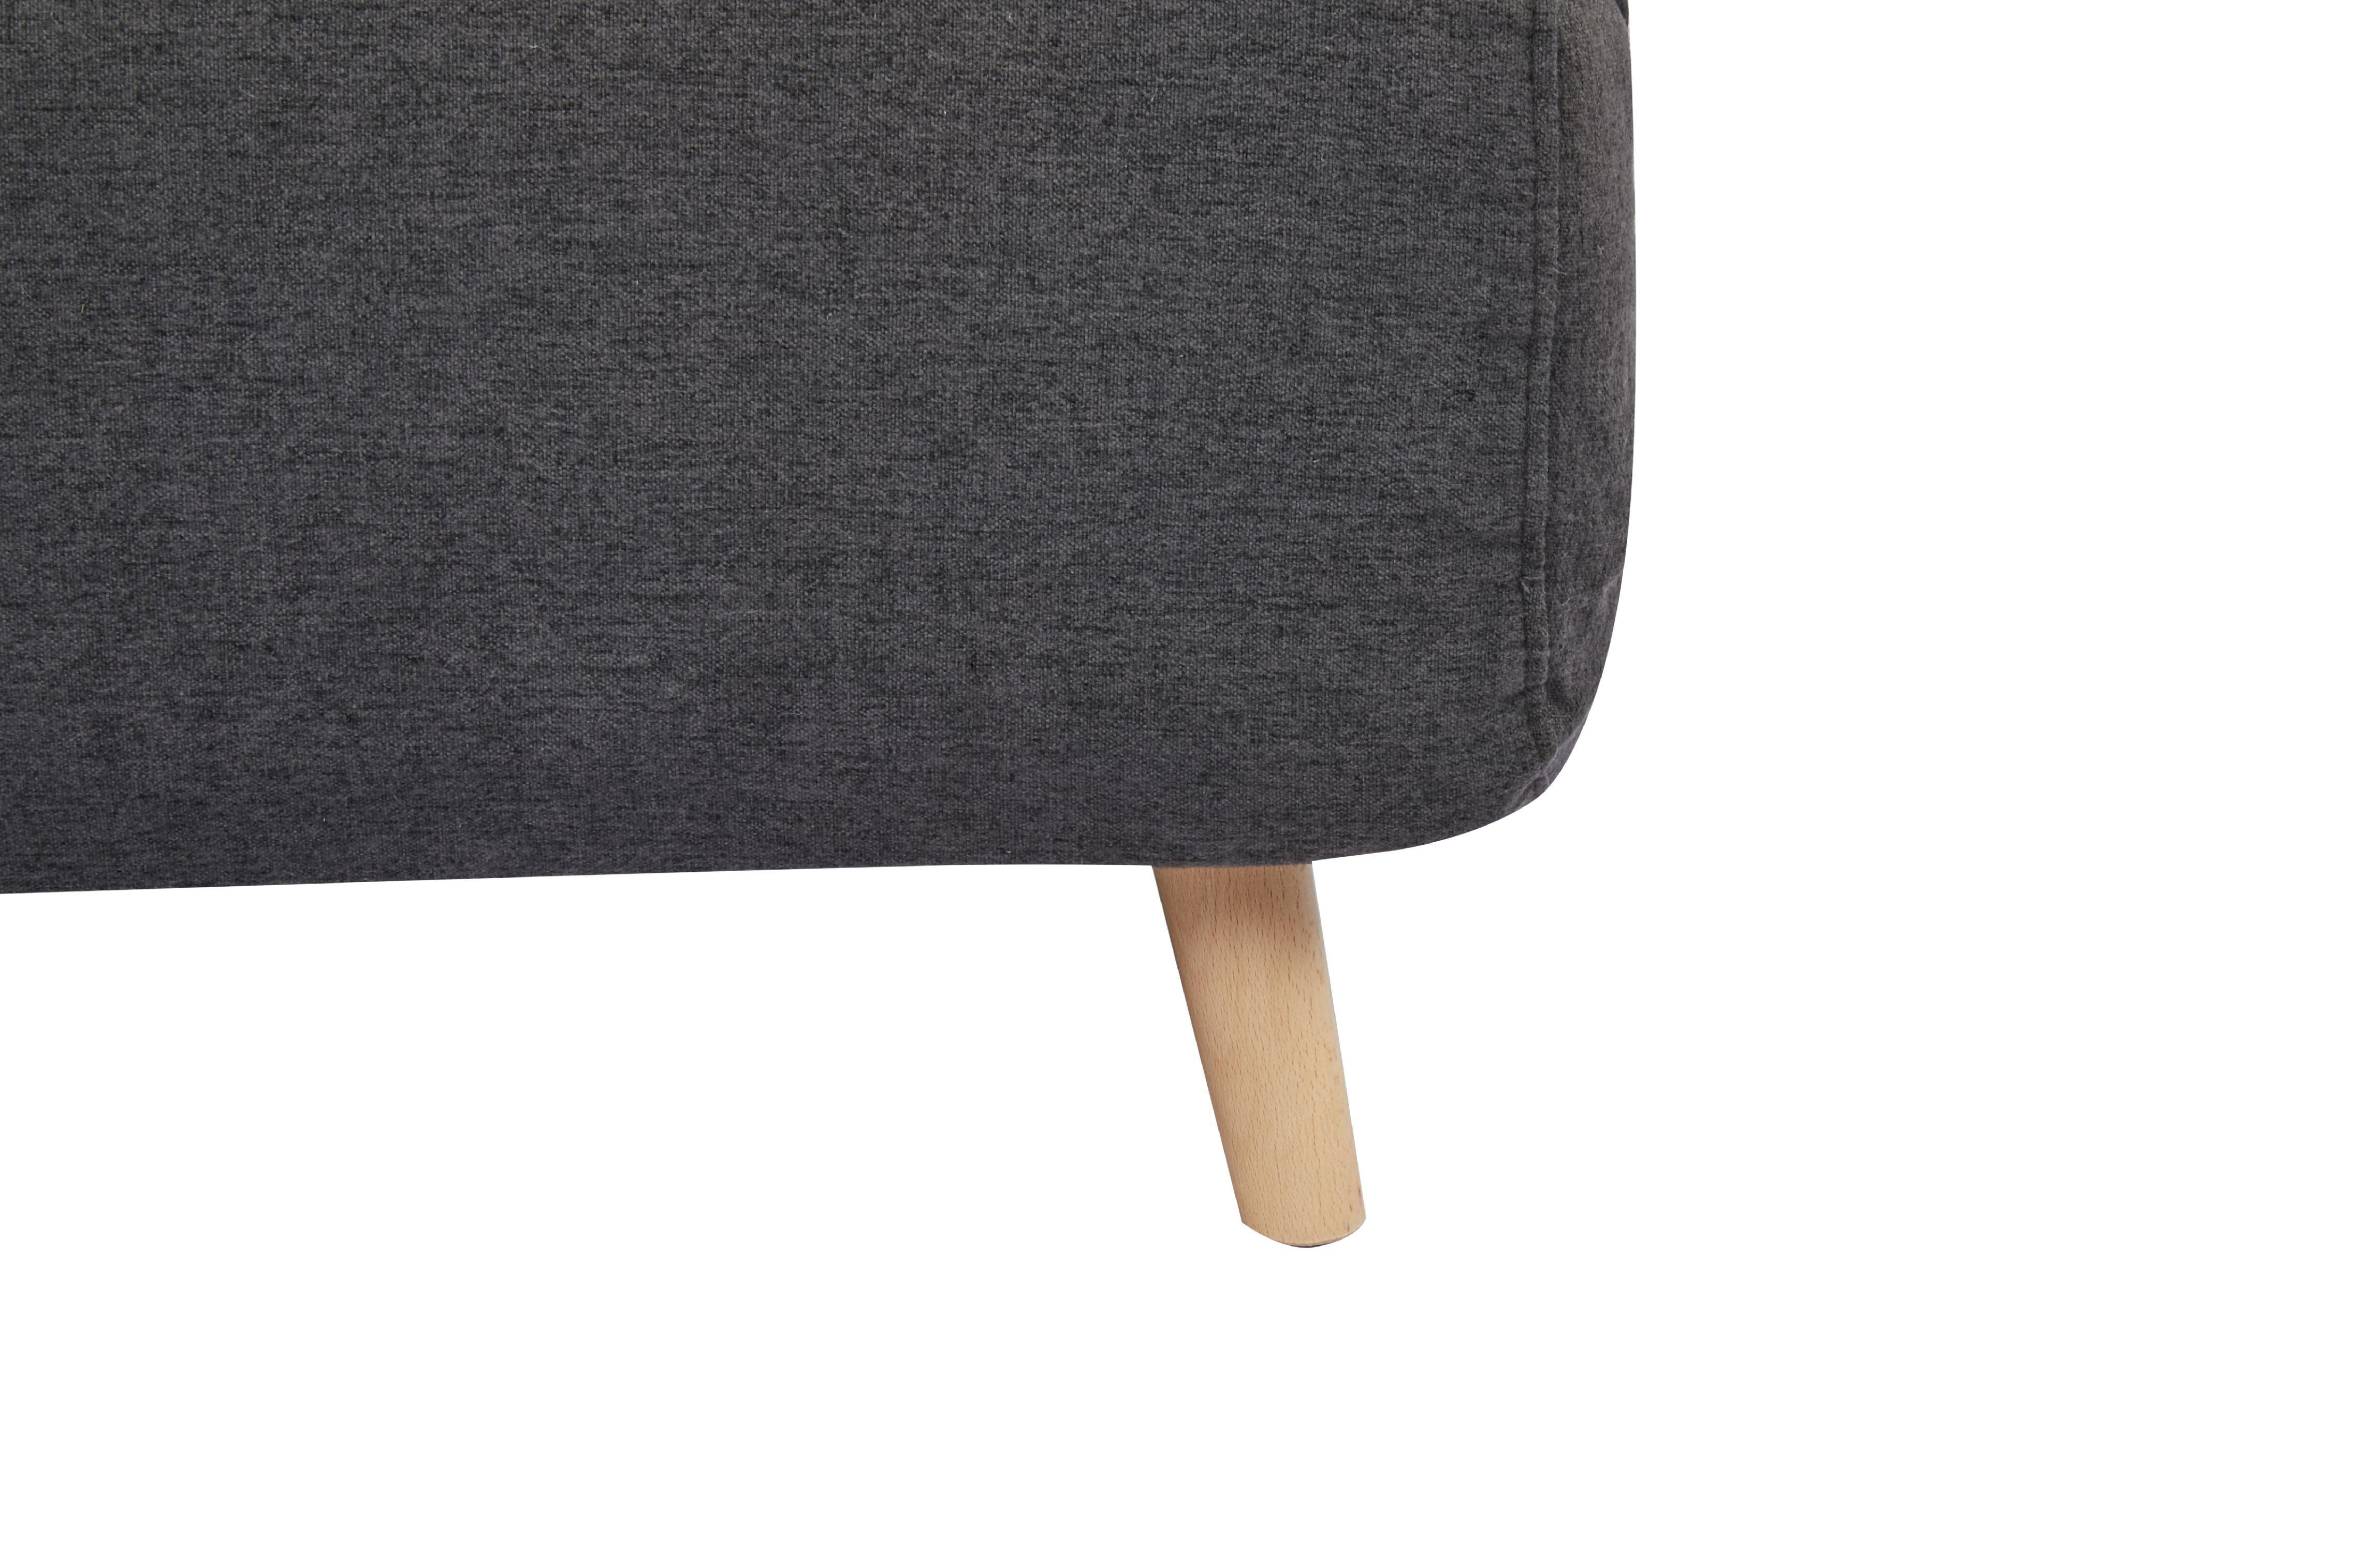 A D Home Tustin Convertible Chair Light Gray Walmart Com Walmart Com